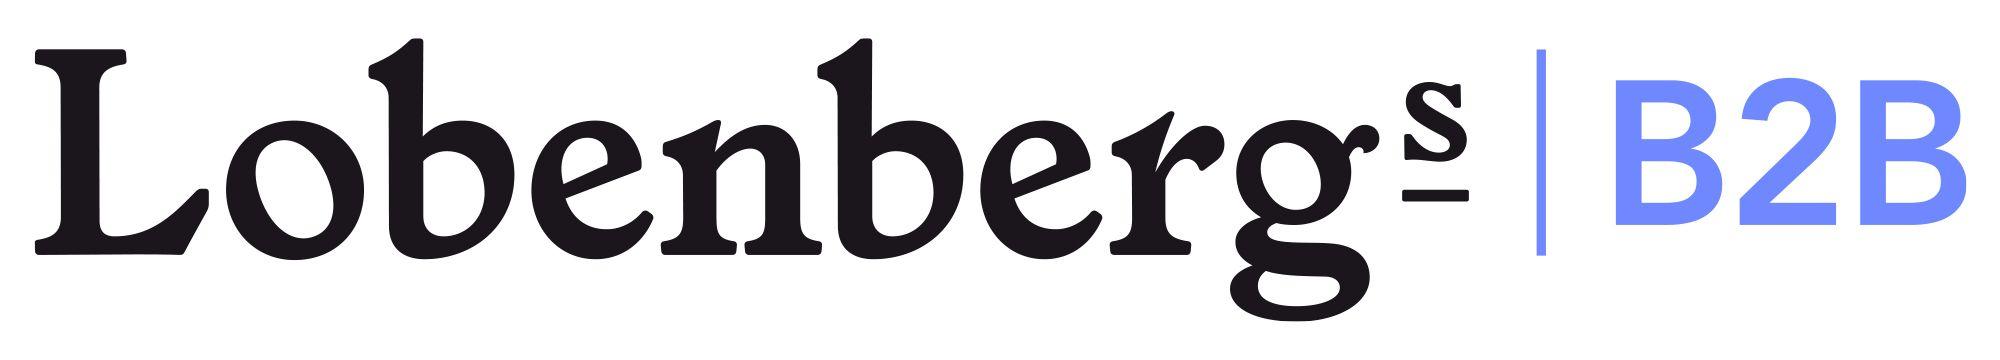 Lobenbergs B2B